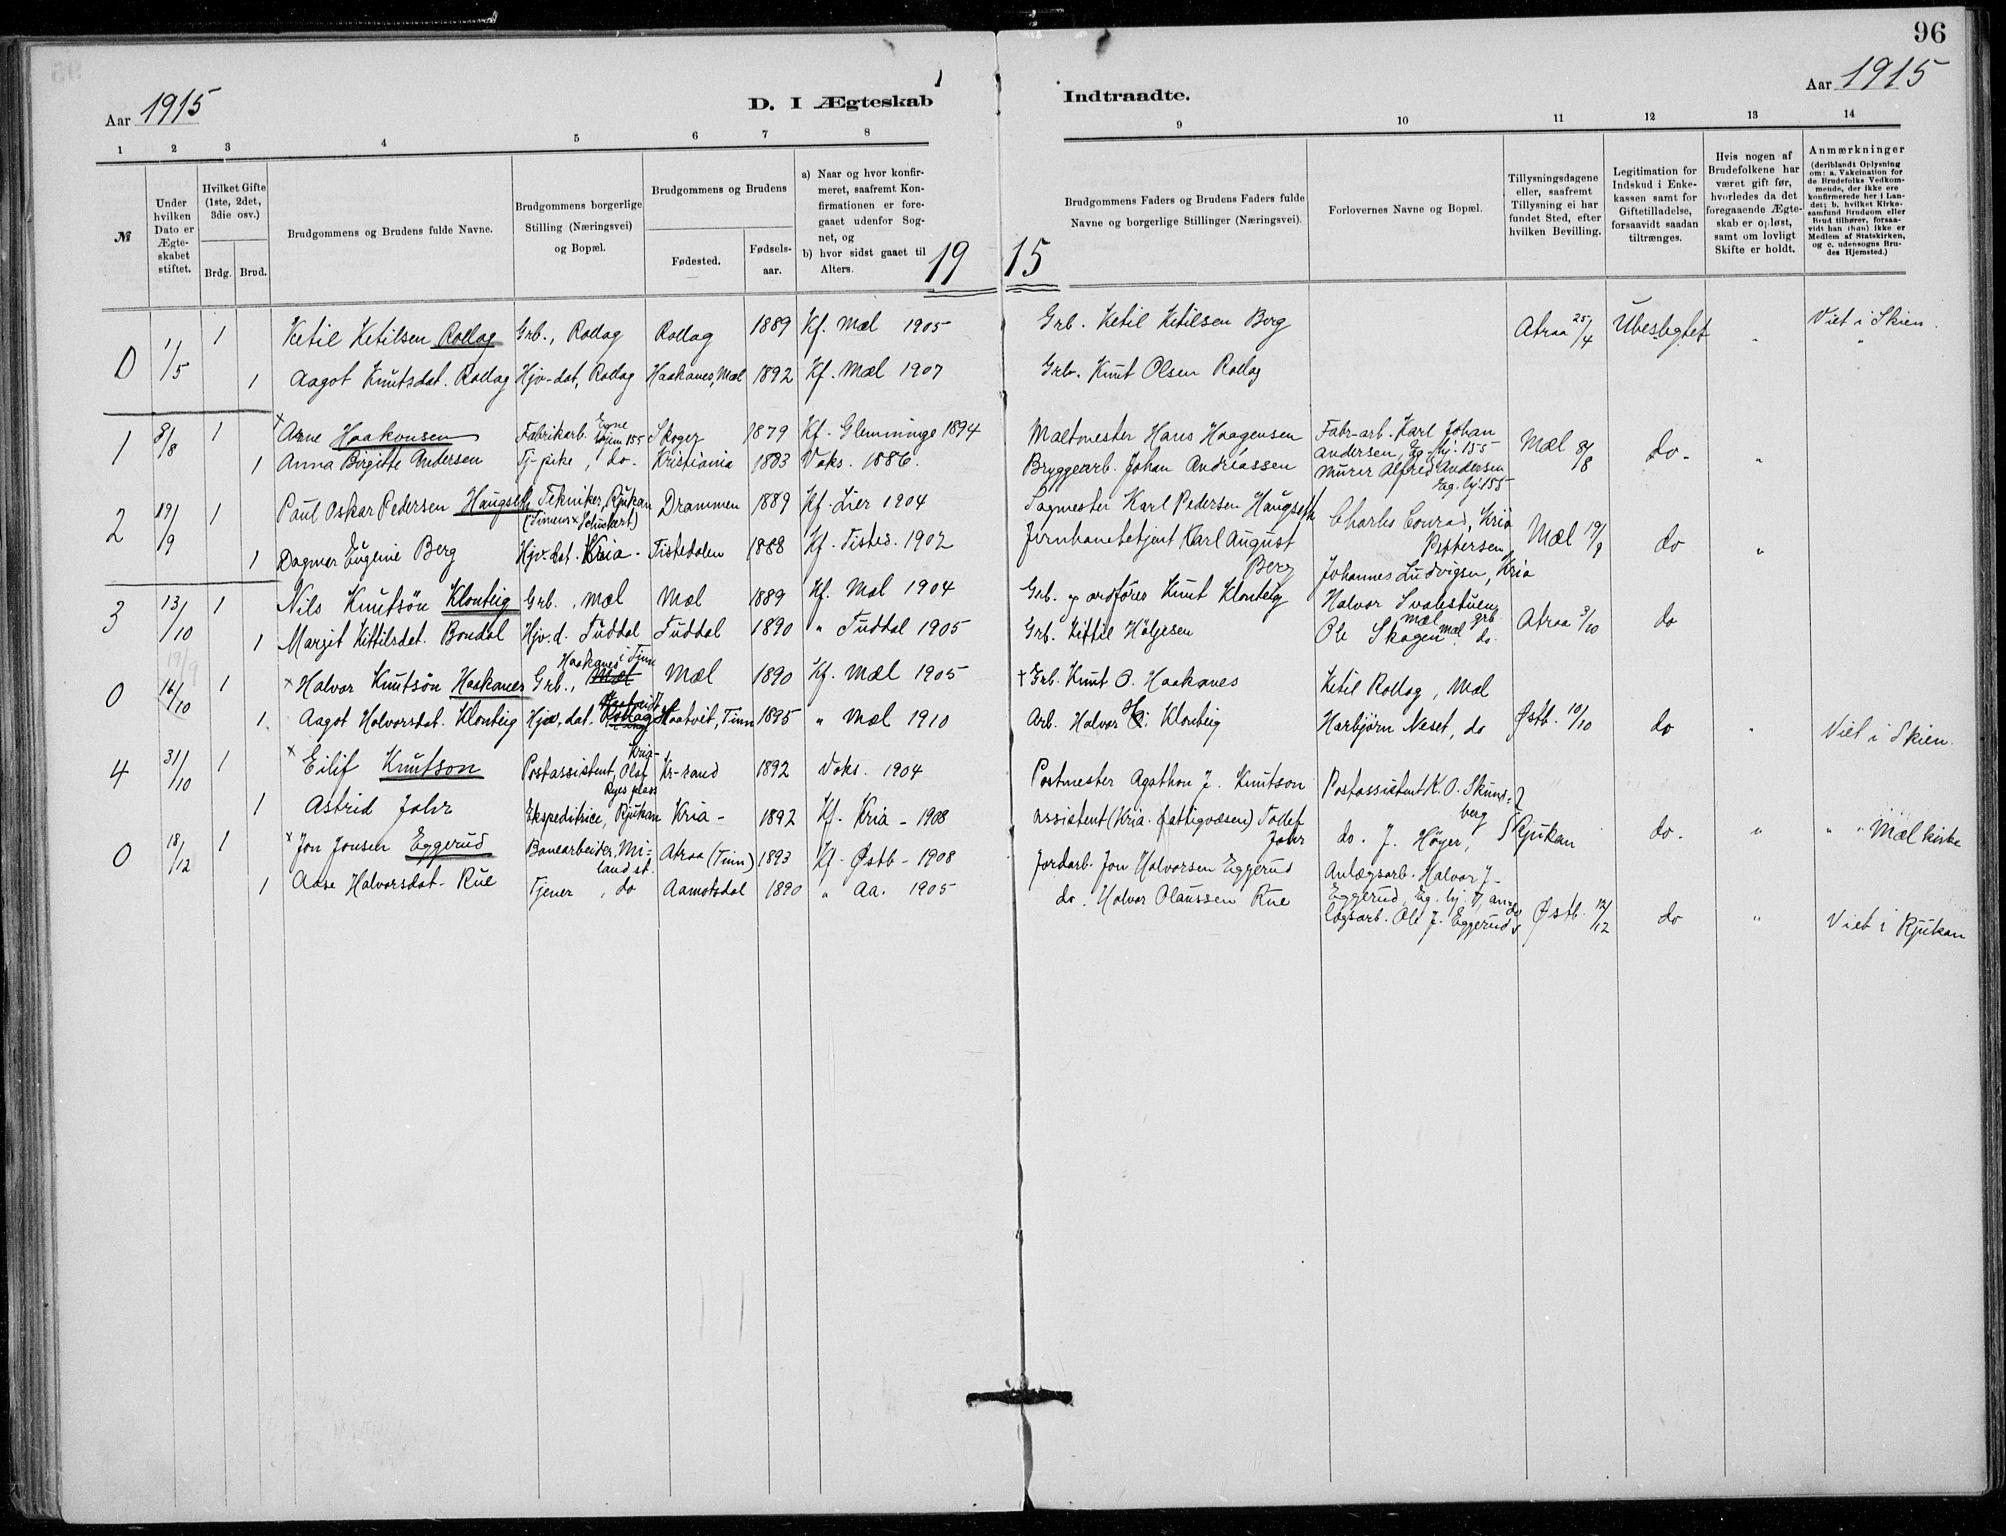 SAKO, Tinn kirkebøker, F/Fb/L0002: Ministerialbok nr. II 2, 1878-1917, s. 96